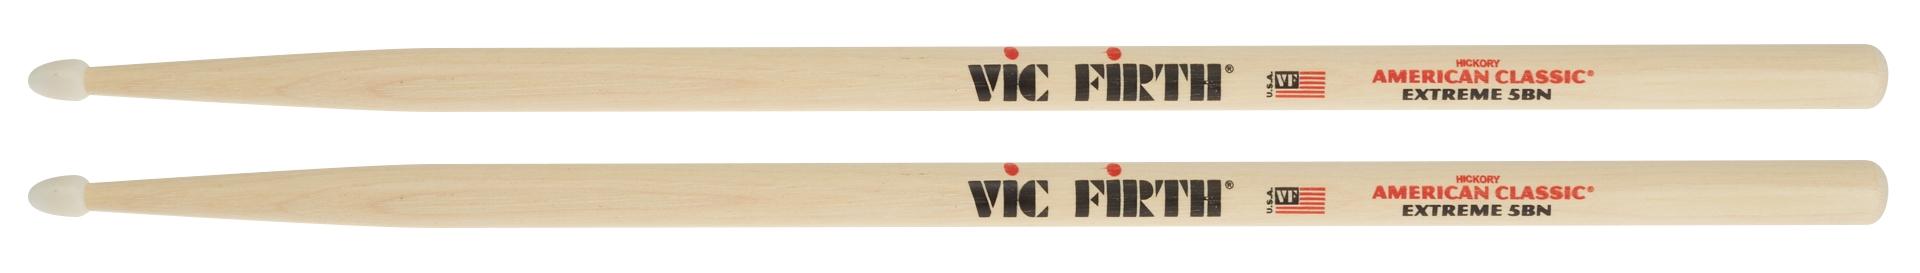 VIC FIRTH X5BN American Classic®